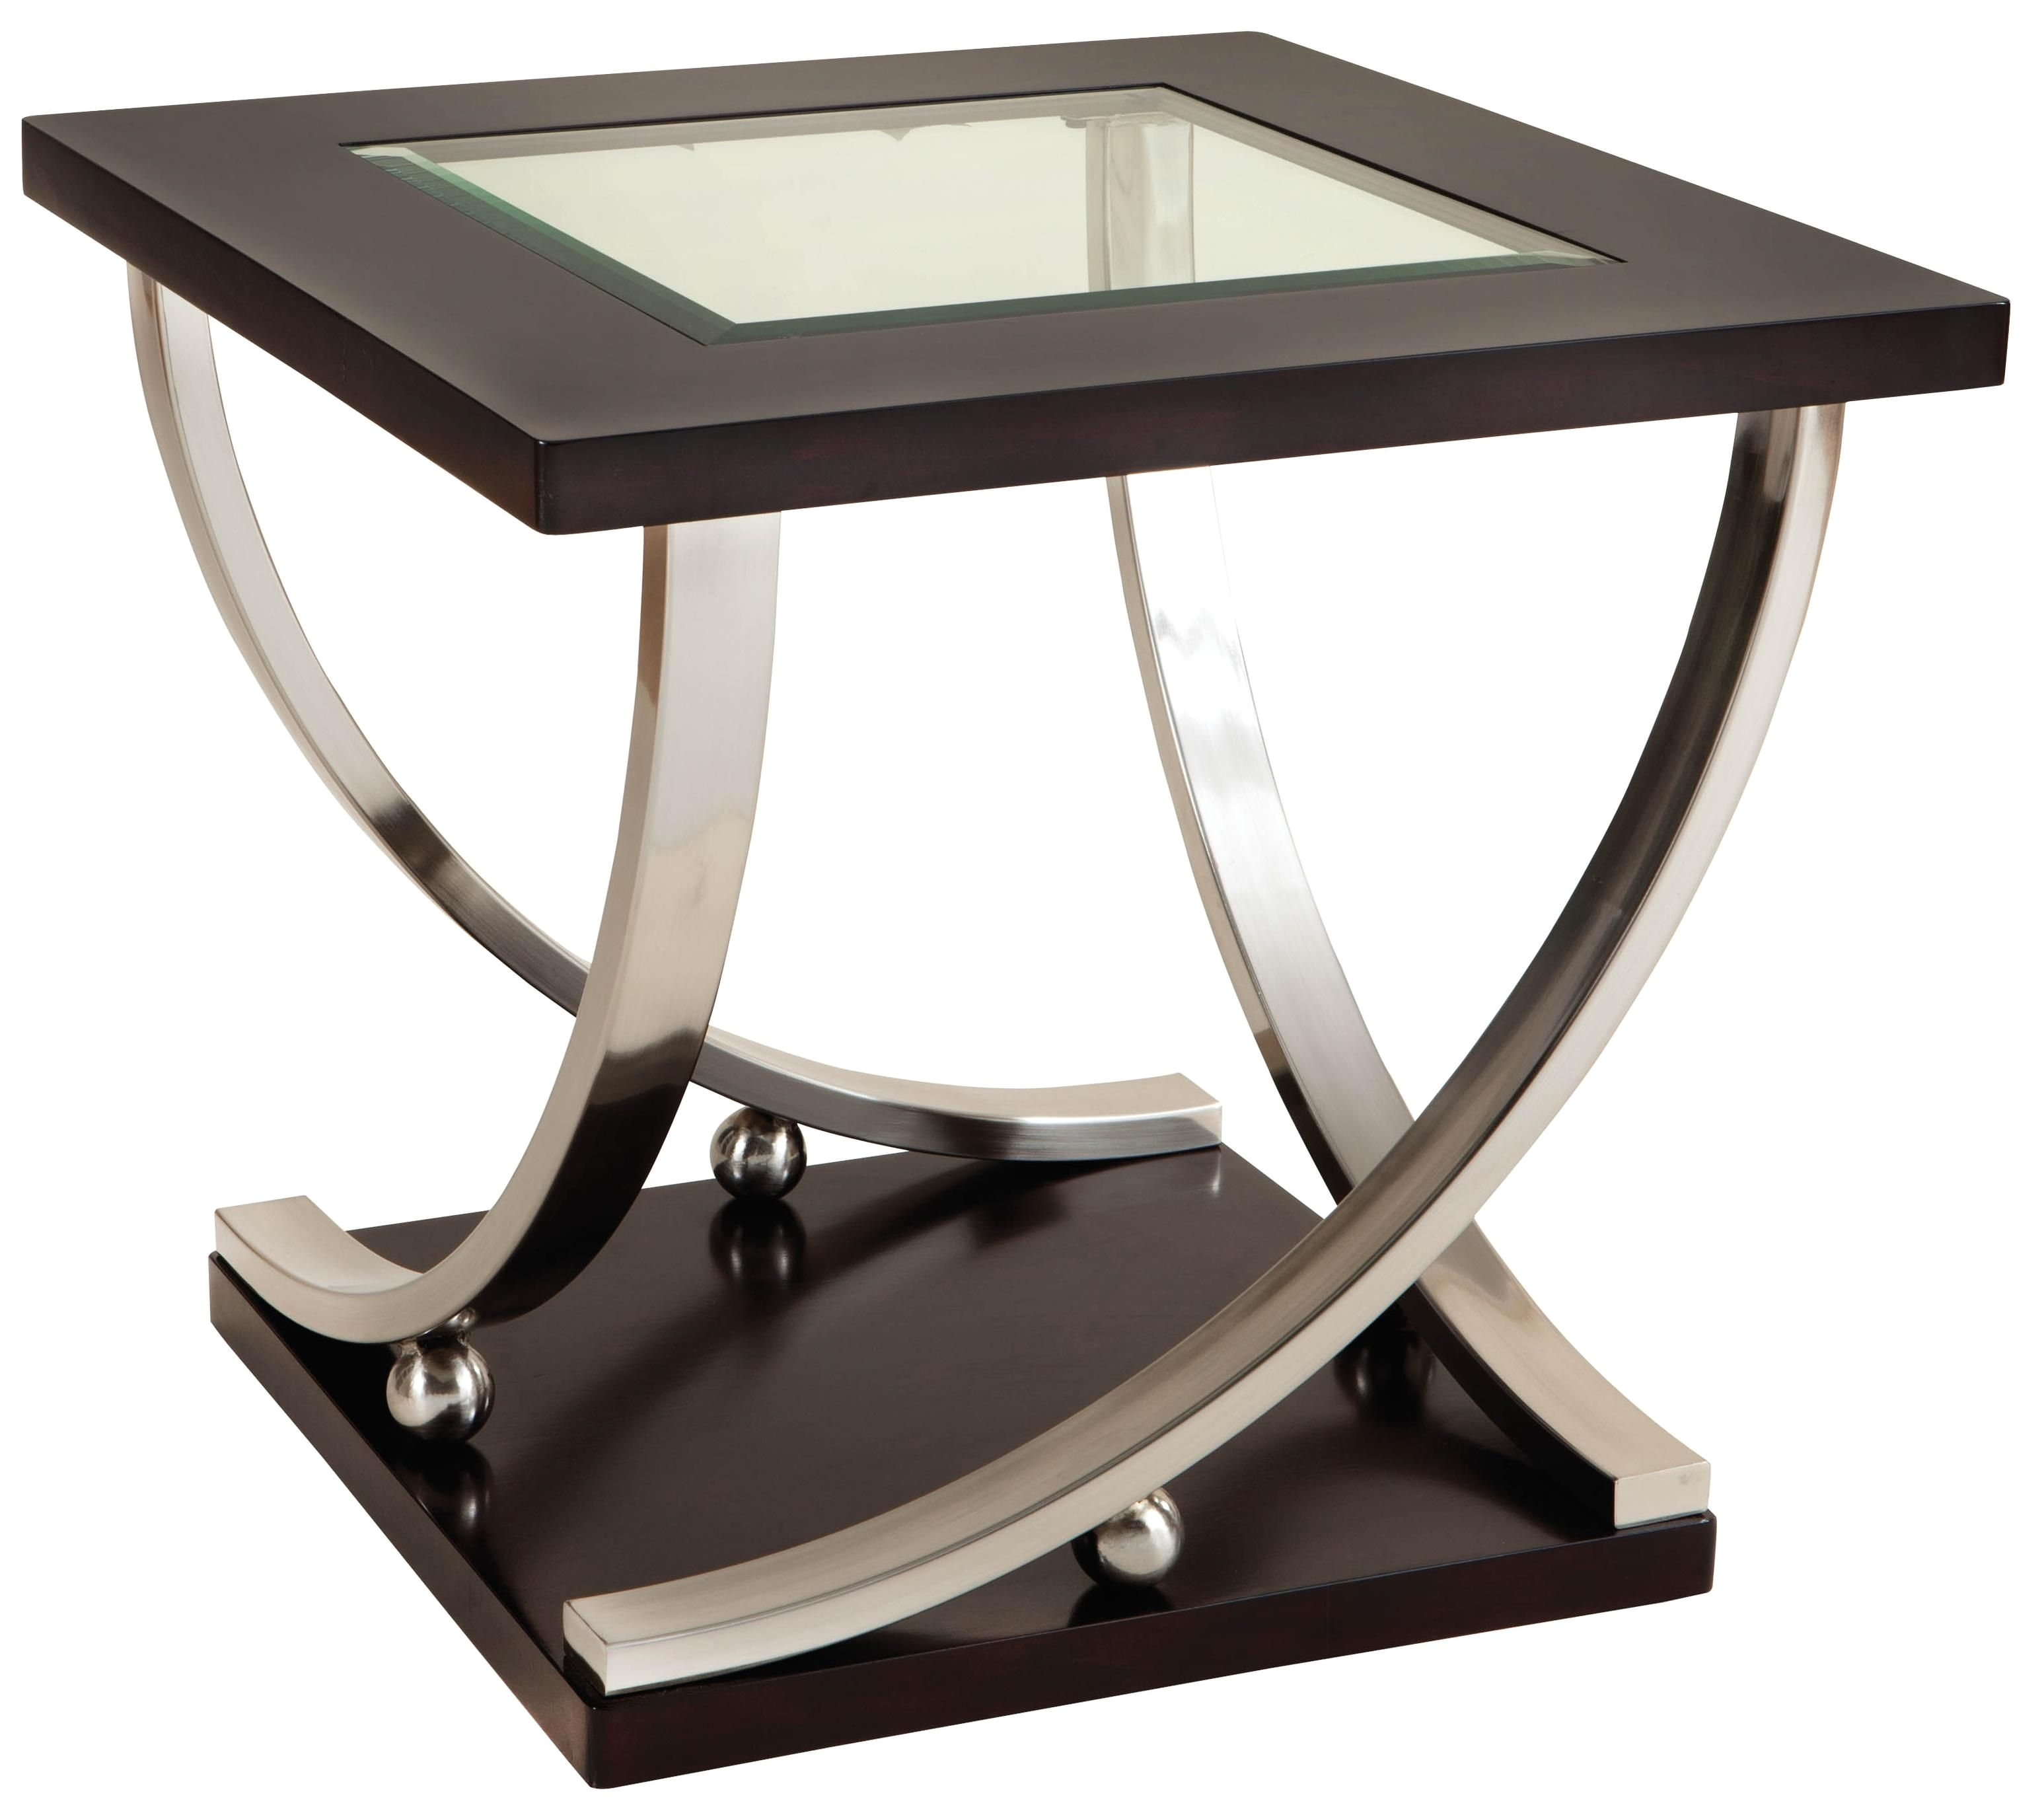 Merlot Square Coffee Table